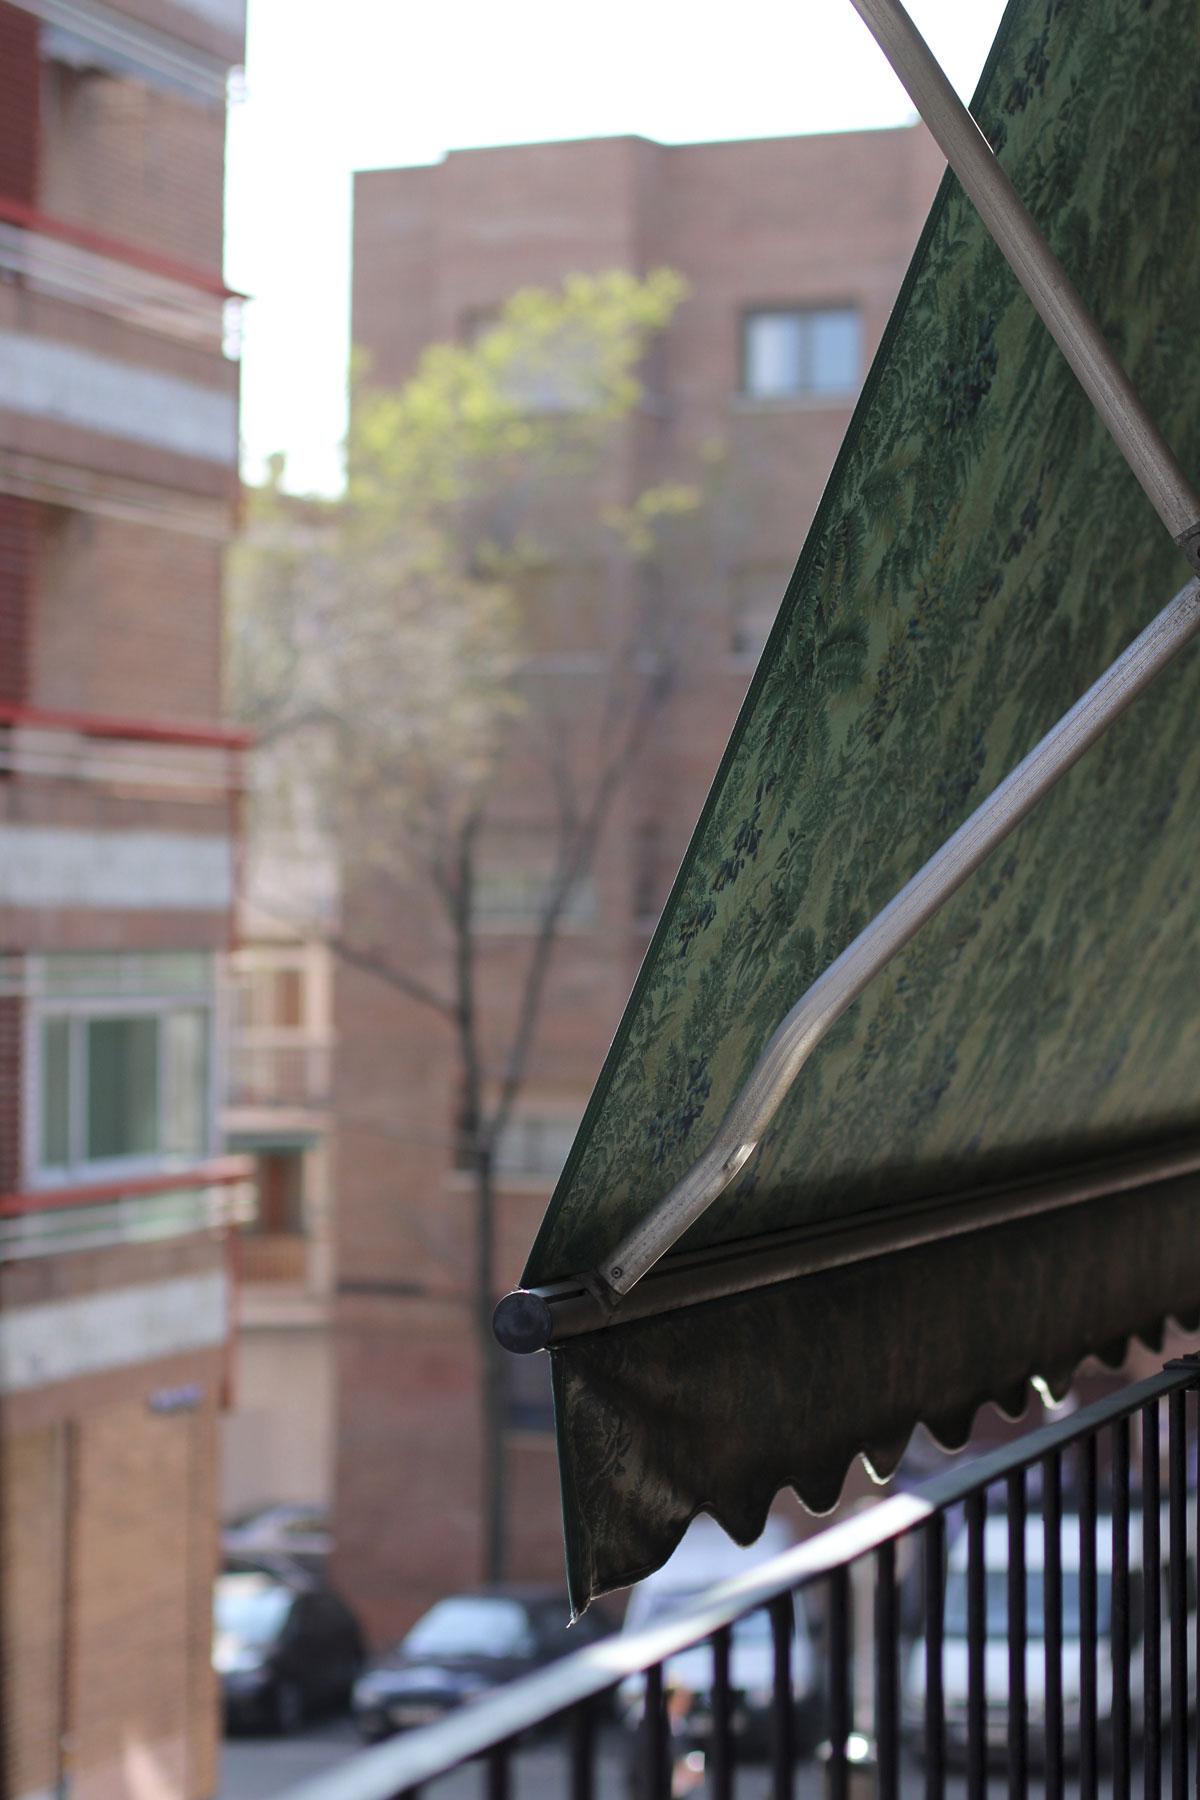 El-rincón-de-lectura-de-Elvira-Navarro-2-©karina-beltrán